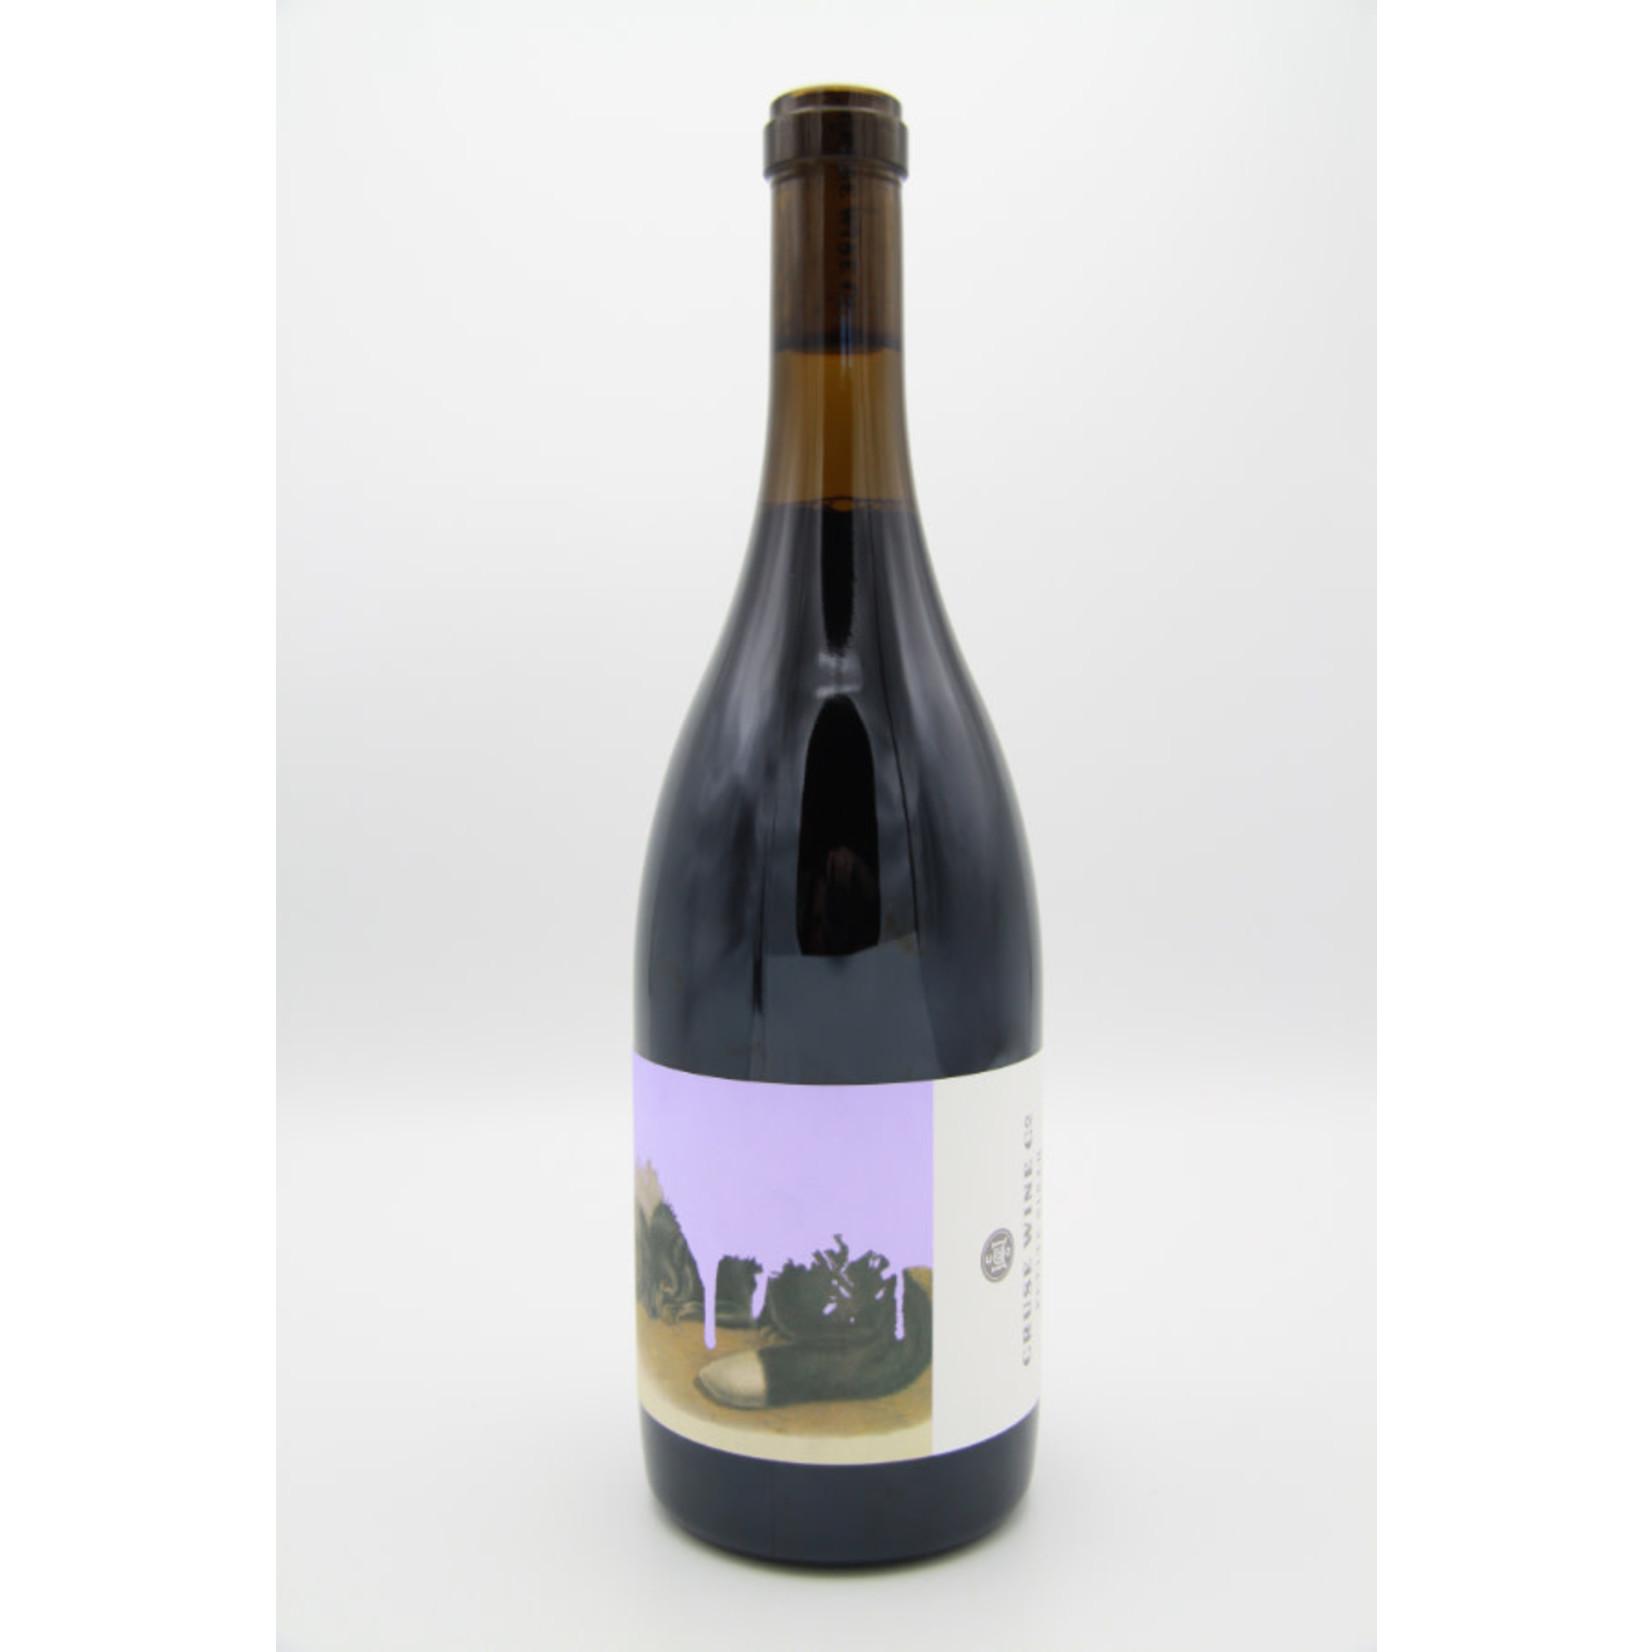 2019 Cruse Wine Co. 'Powicana' Petite Sirah